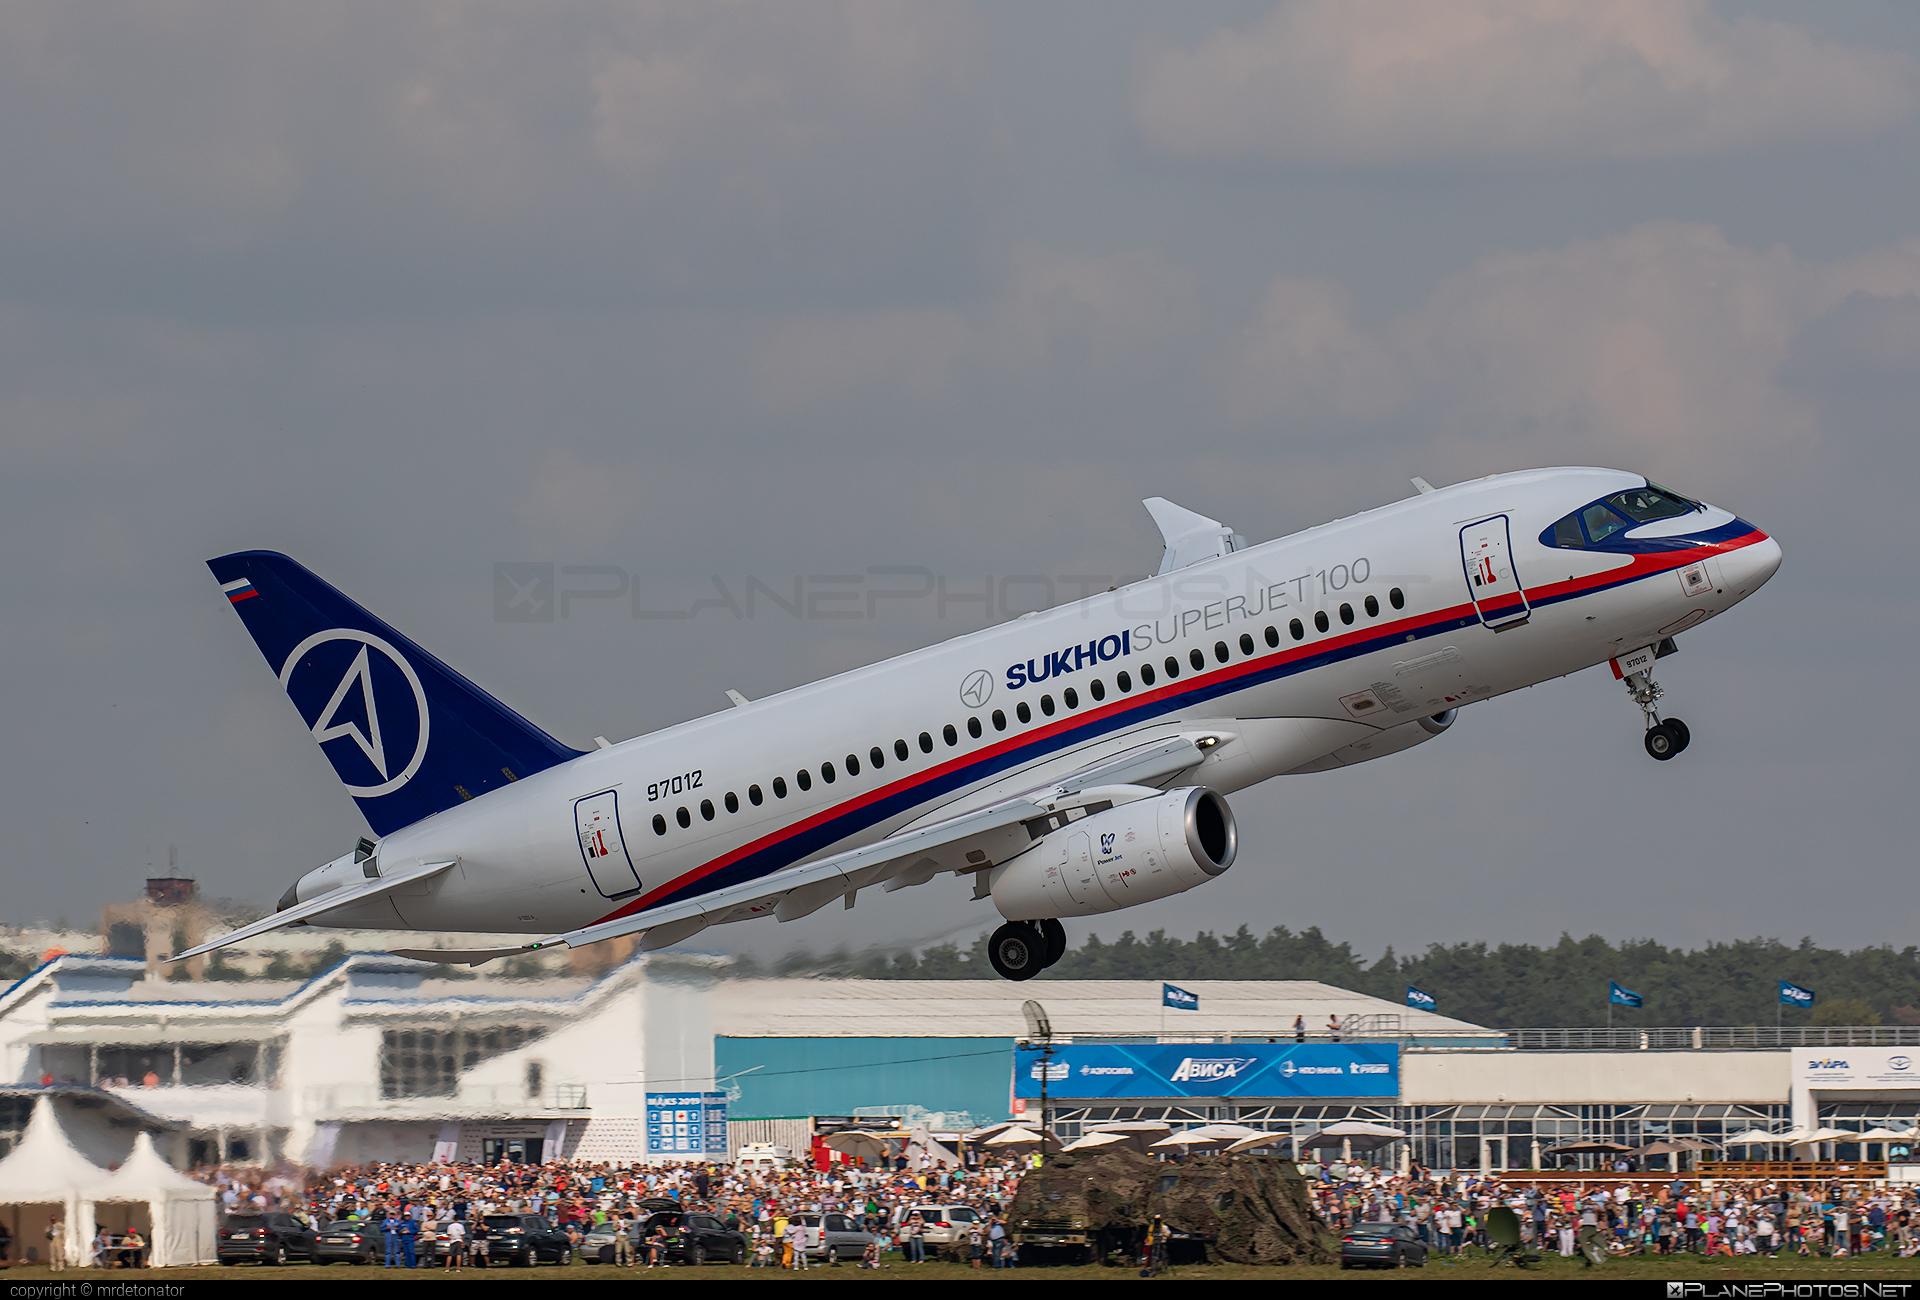 Sukhoi SSJ 100-95B Superjet - 97012 operated by Sukhoi Design Bureau #ssj100 #ssj10095b #sukhoi #sukhoisuperjet #superjet